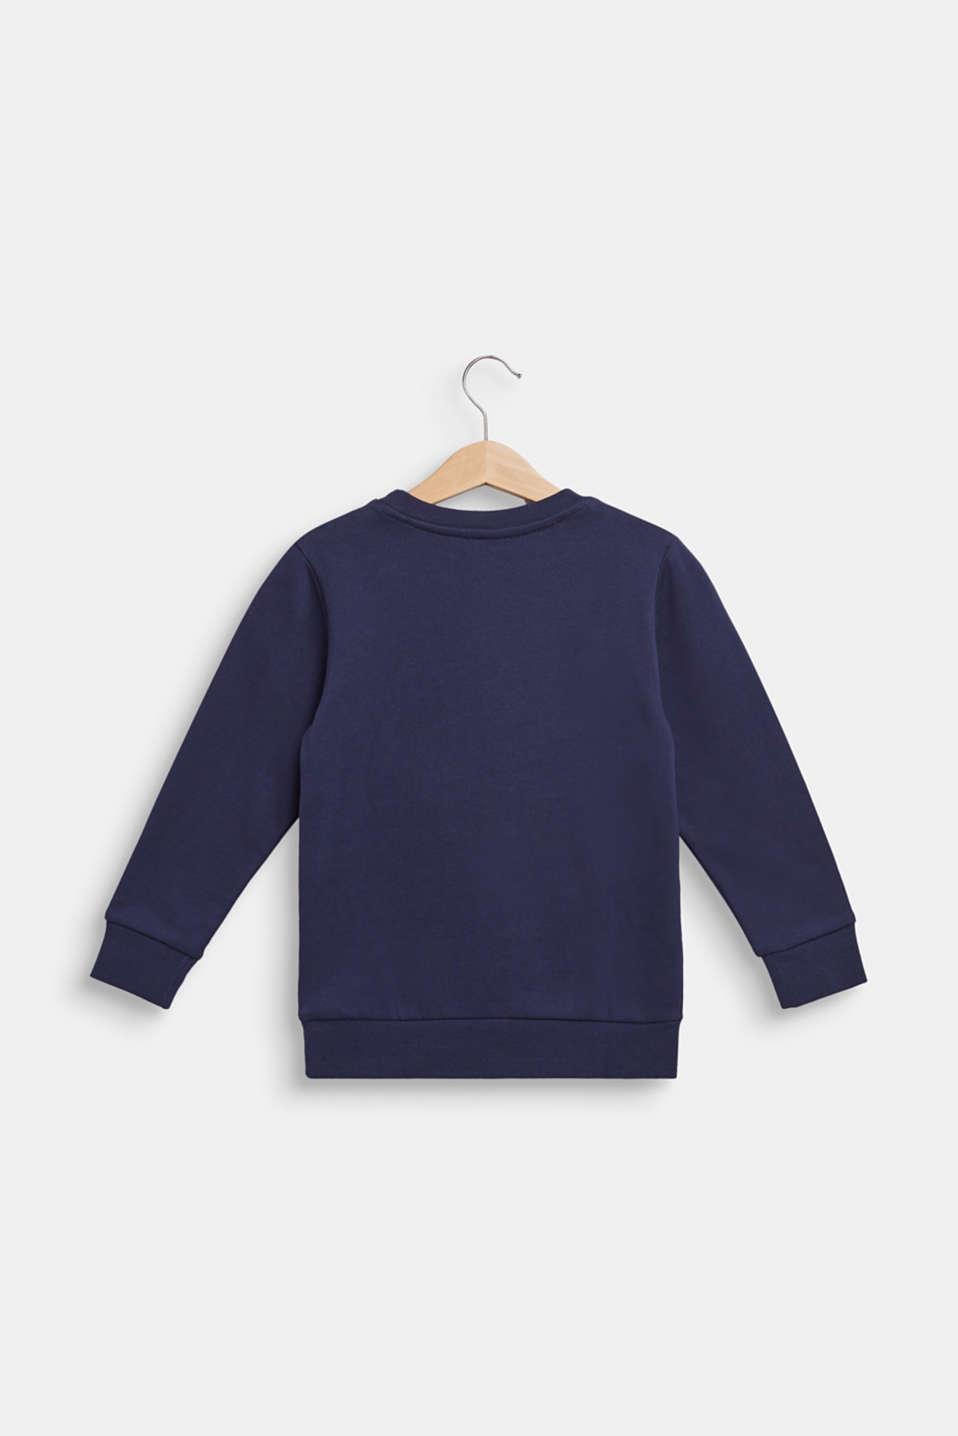 Sweatshirt in 100% cotton, ULTRAMARINE, detail image number 1